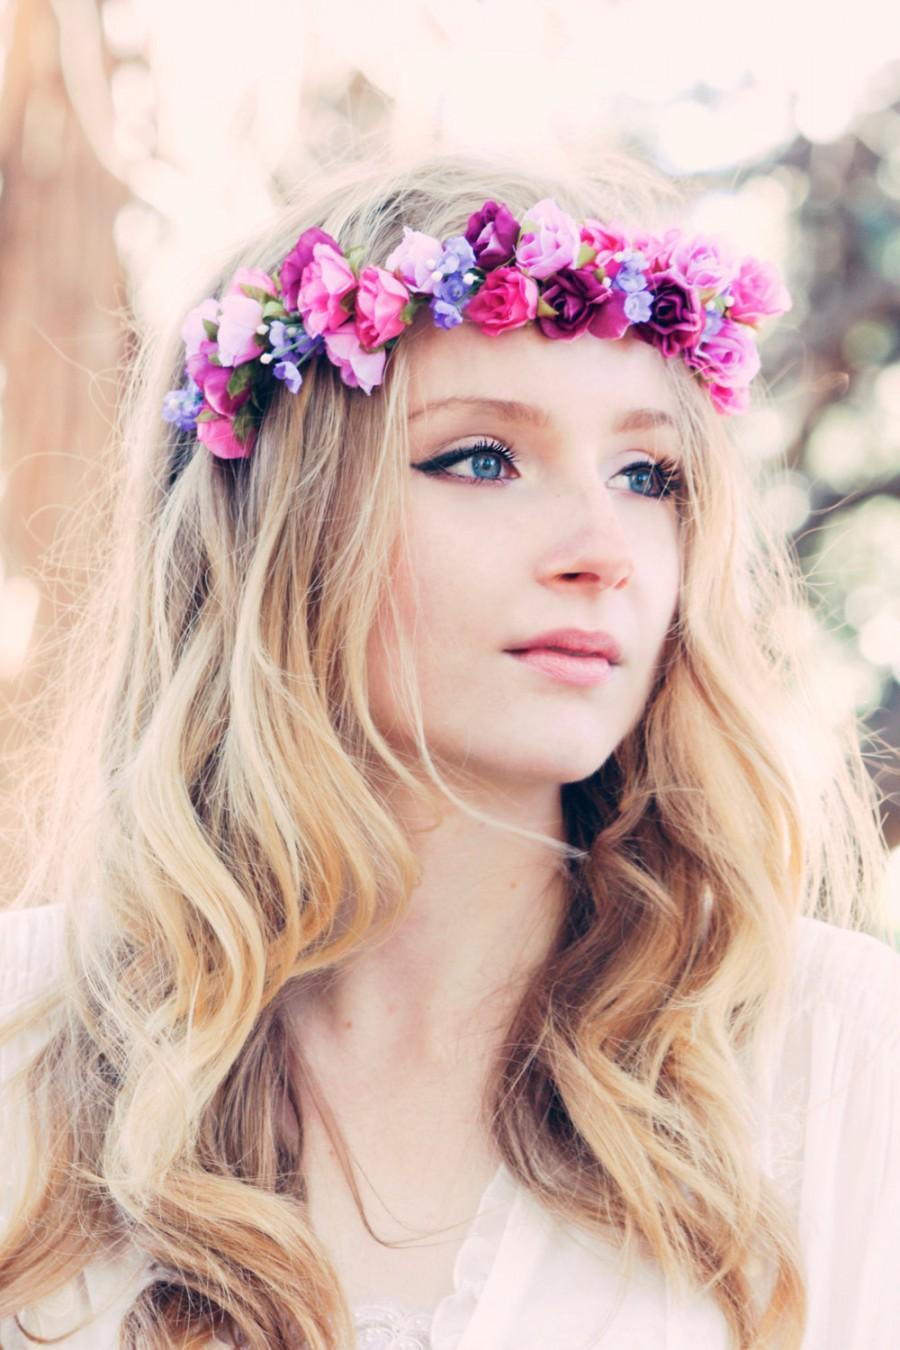 زفاف - wedding flower bridal hair accessory roses hair wreath headpiece flower for hair